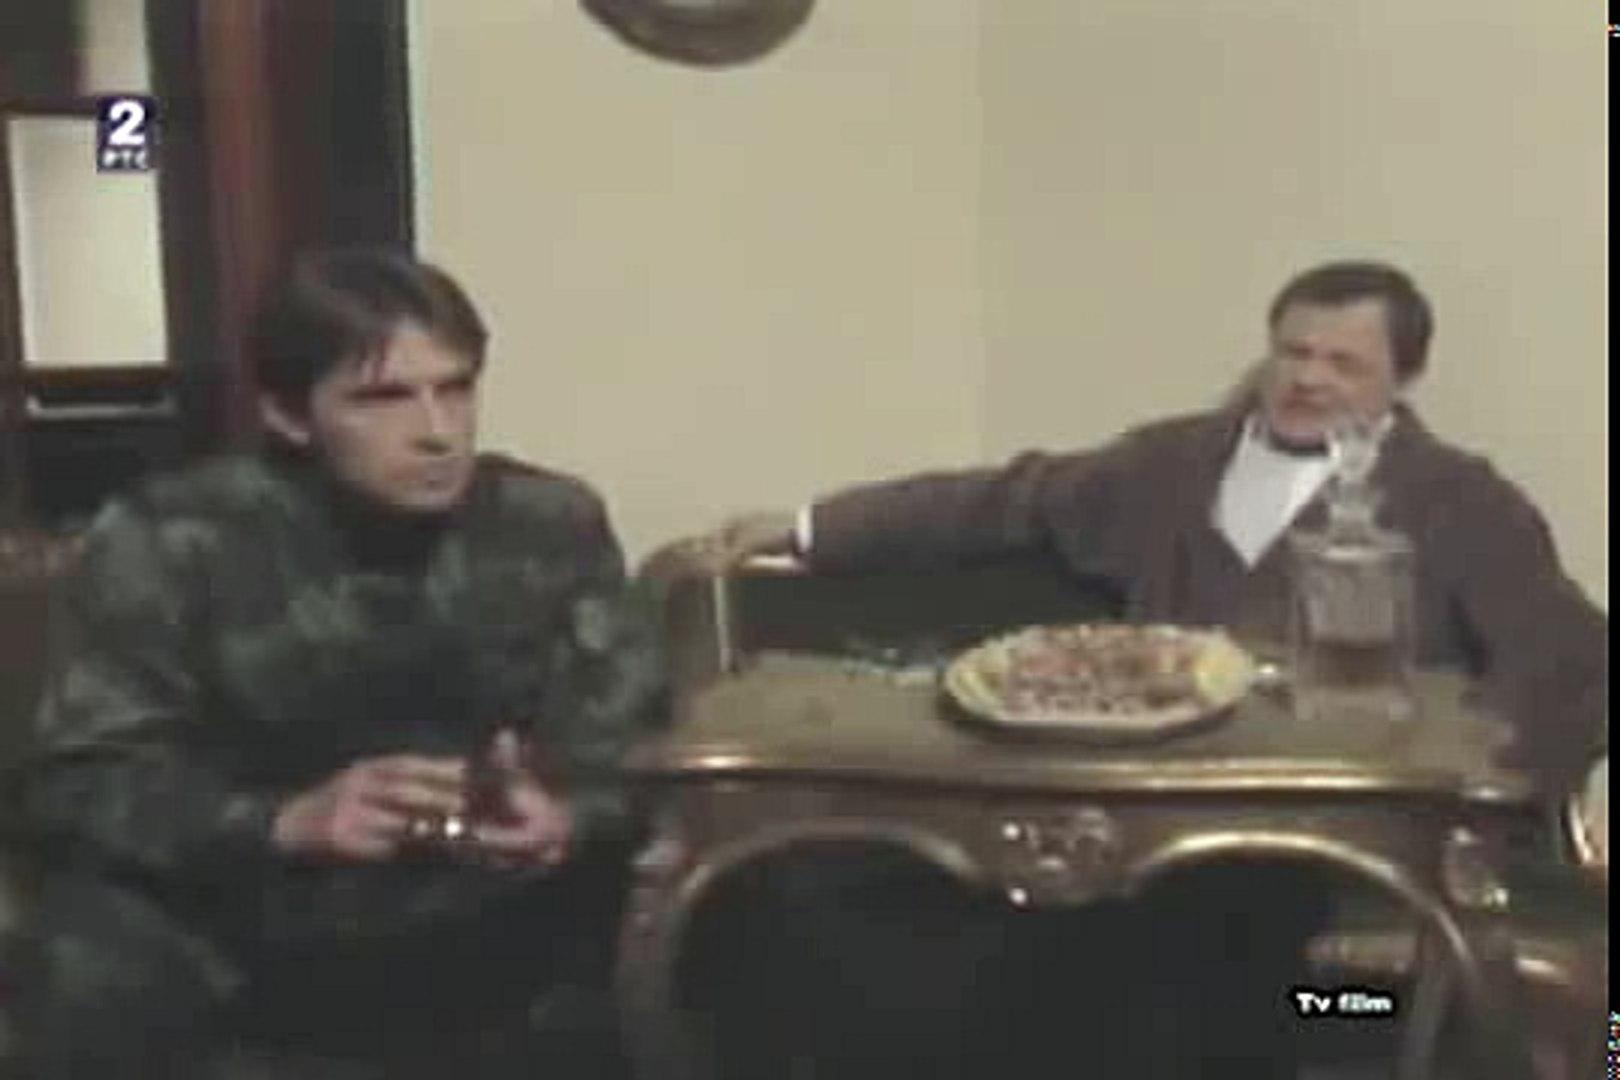 Boje slepila   /   1991 Domaći film